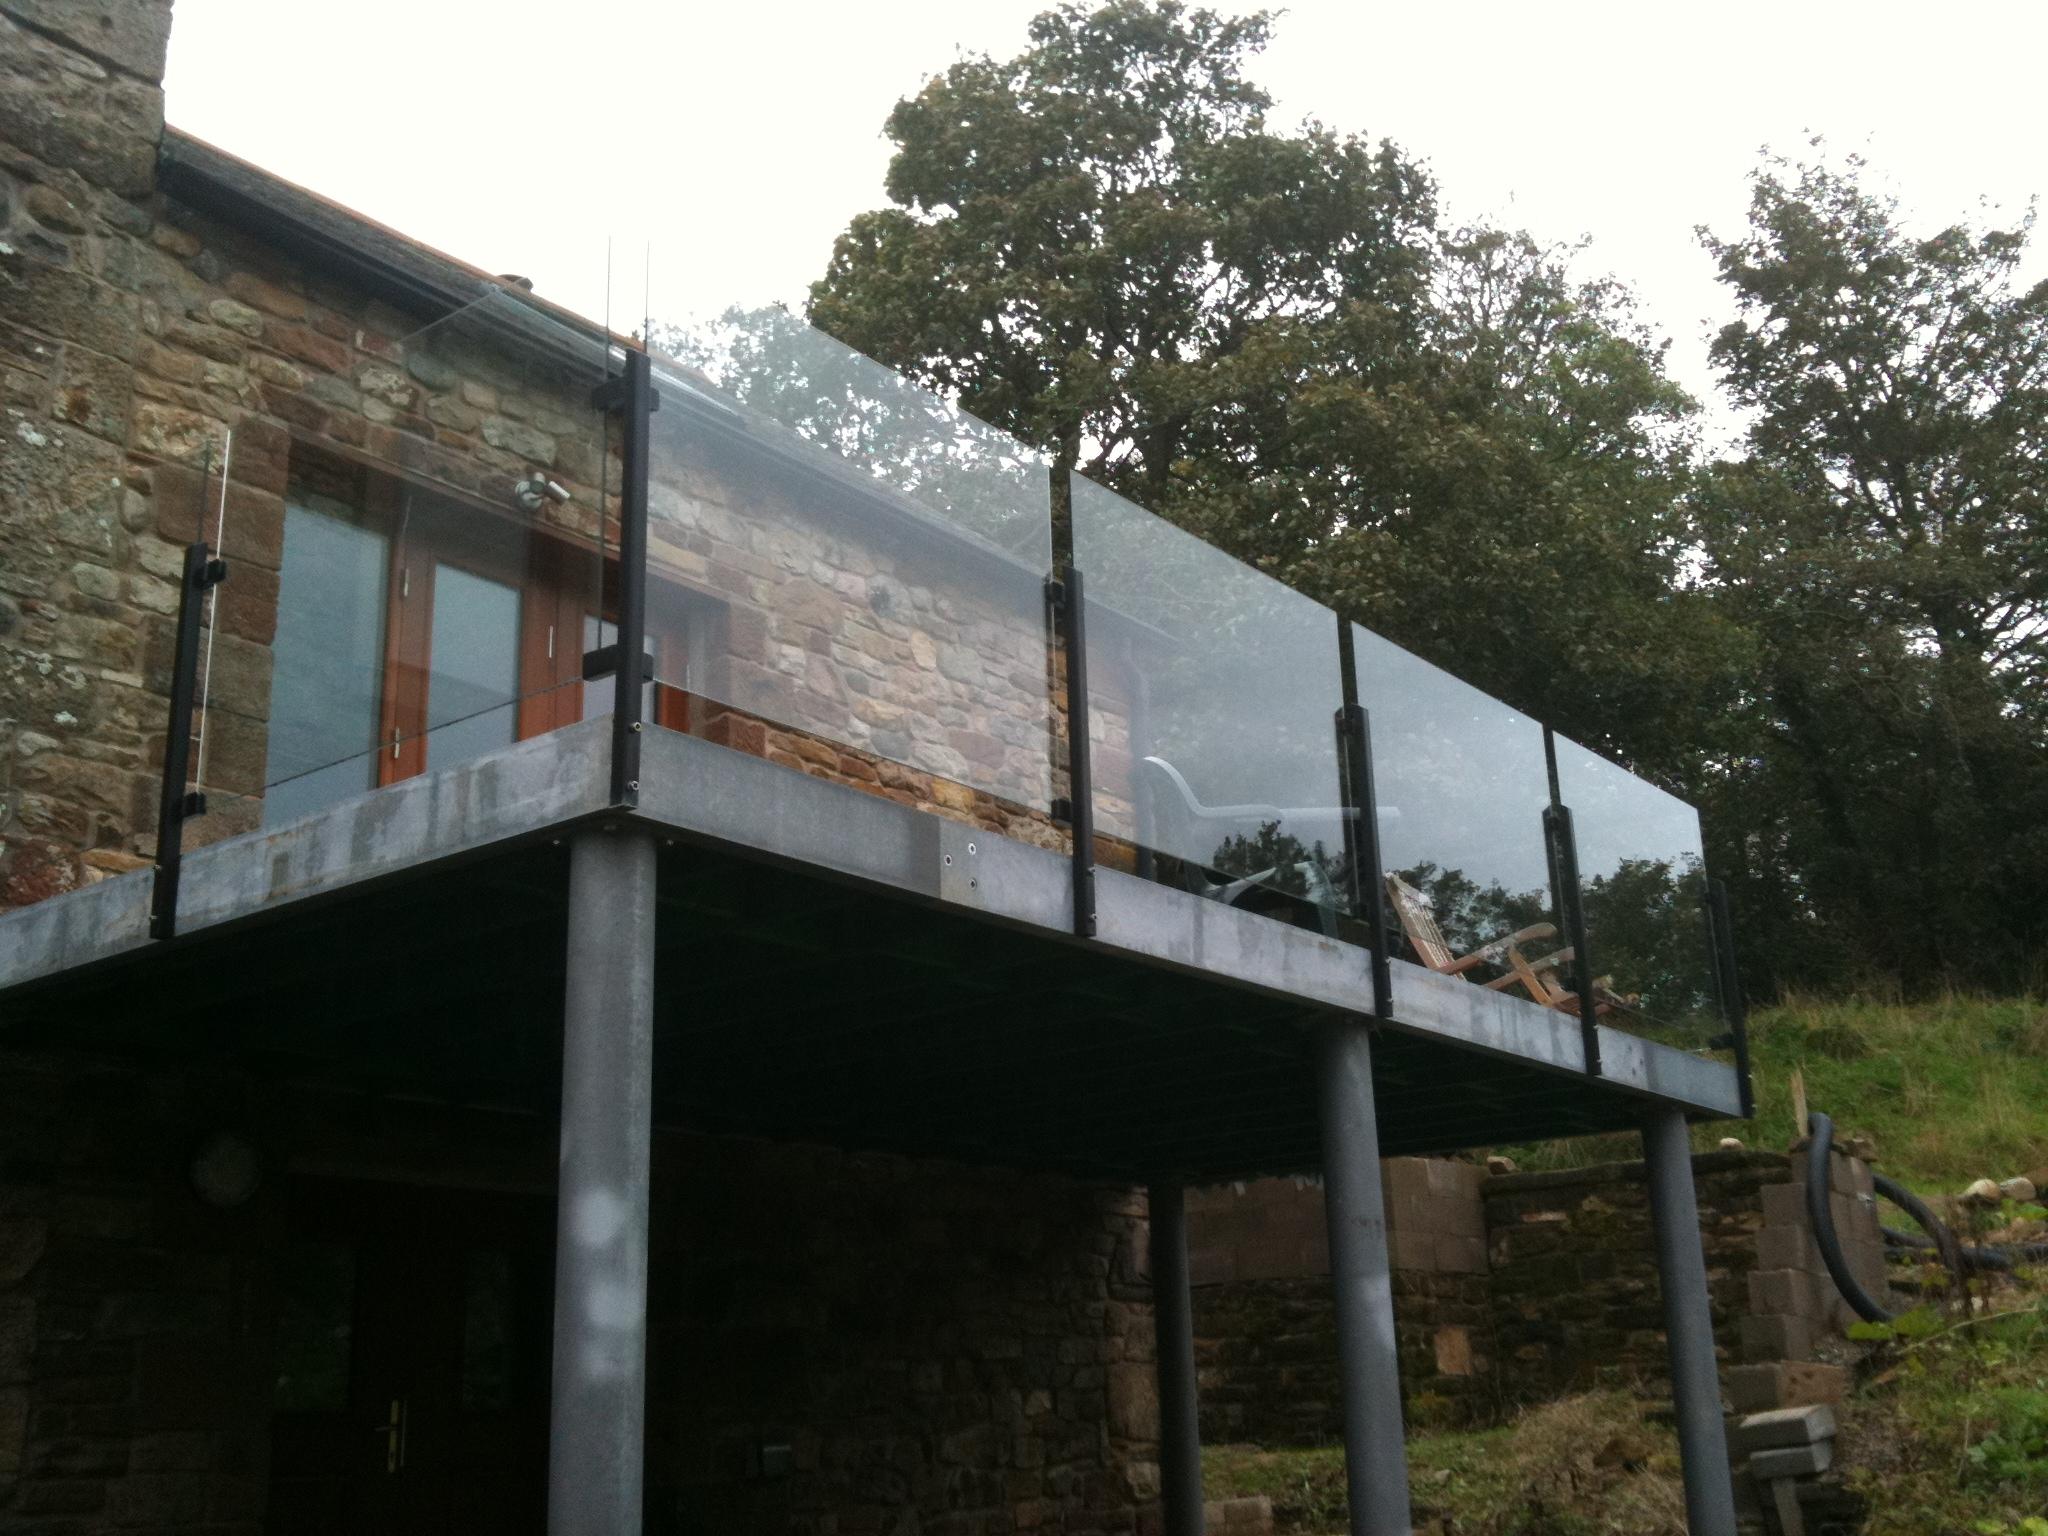 Bespoke balustrade